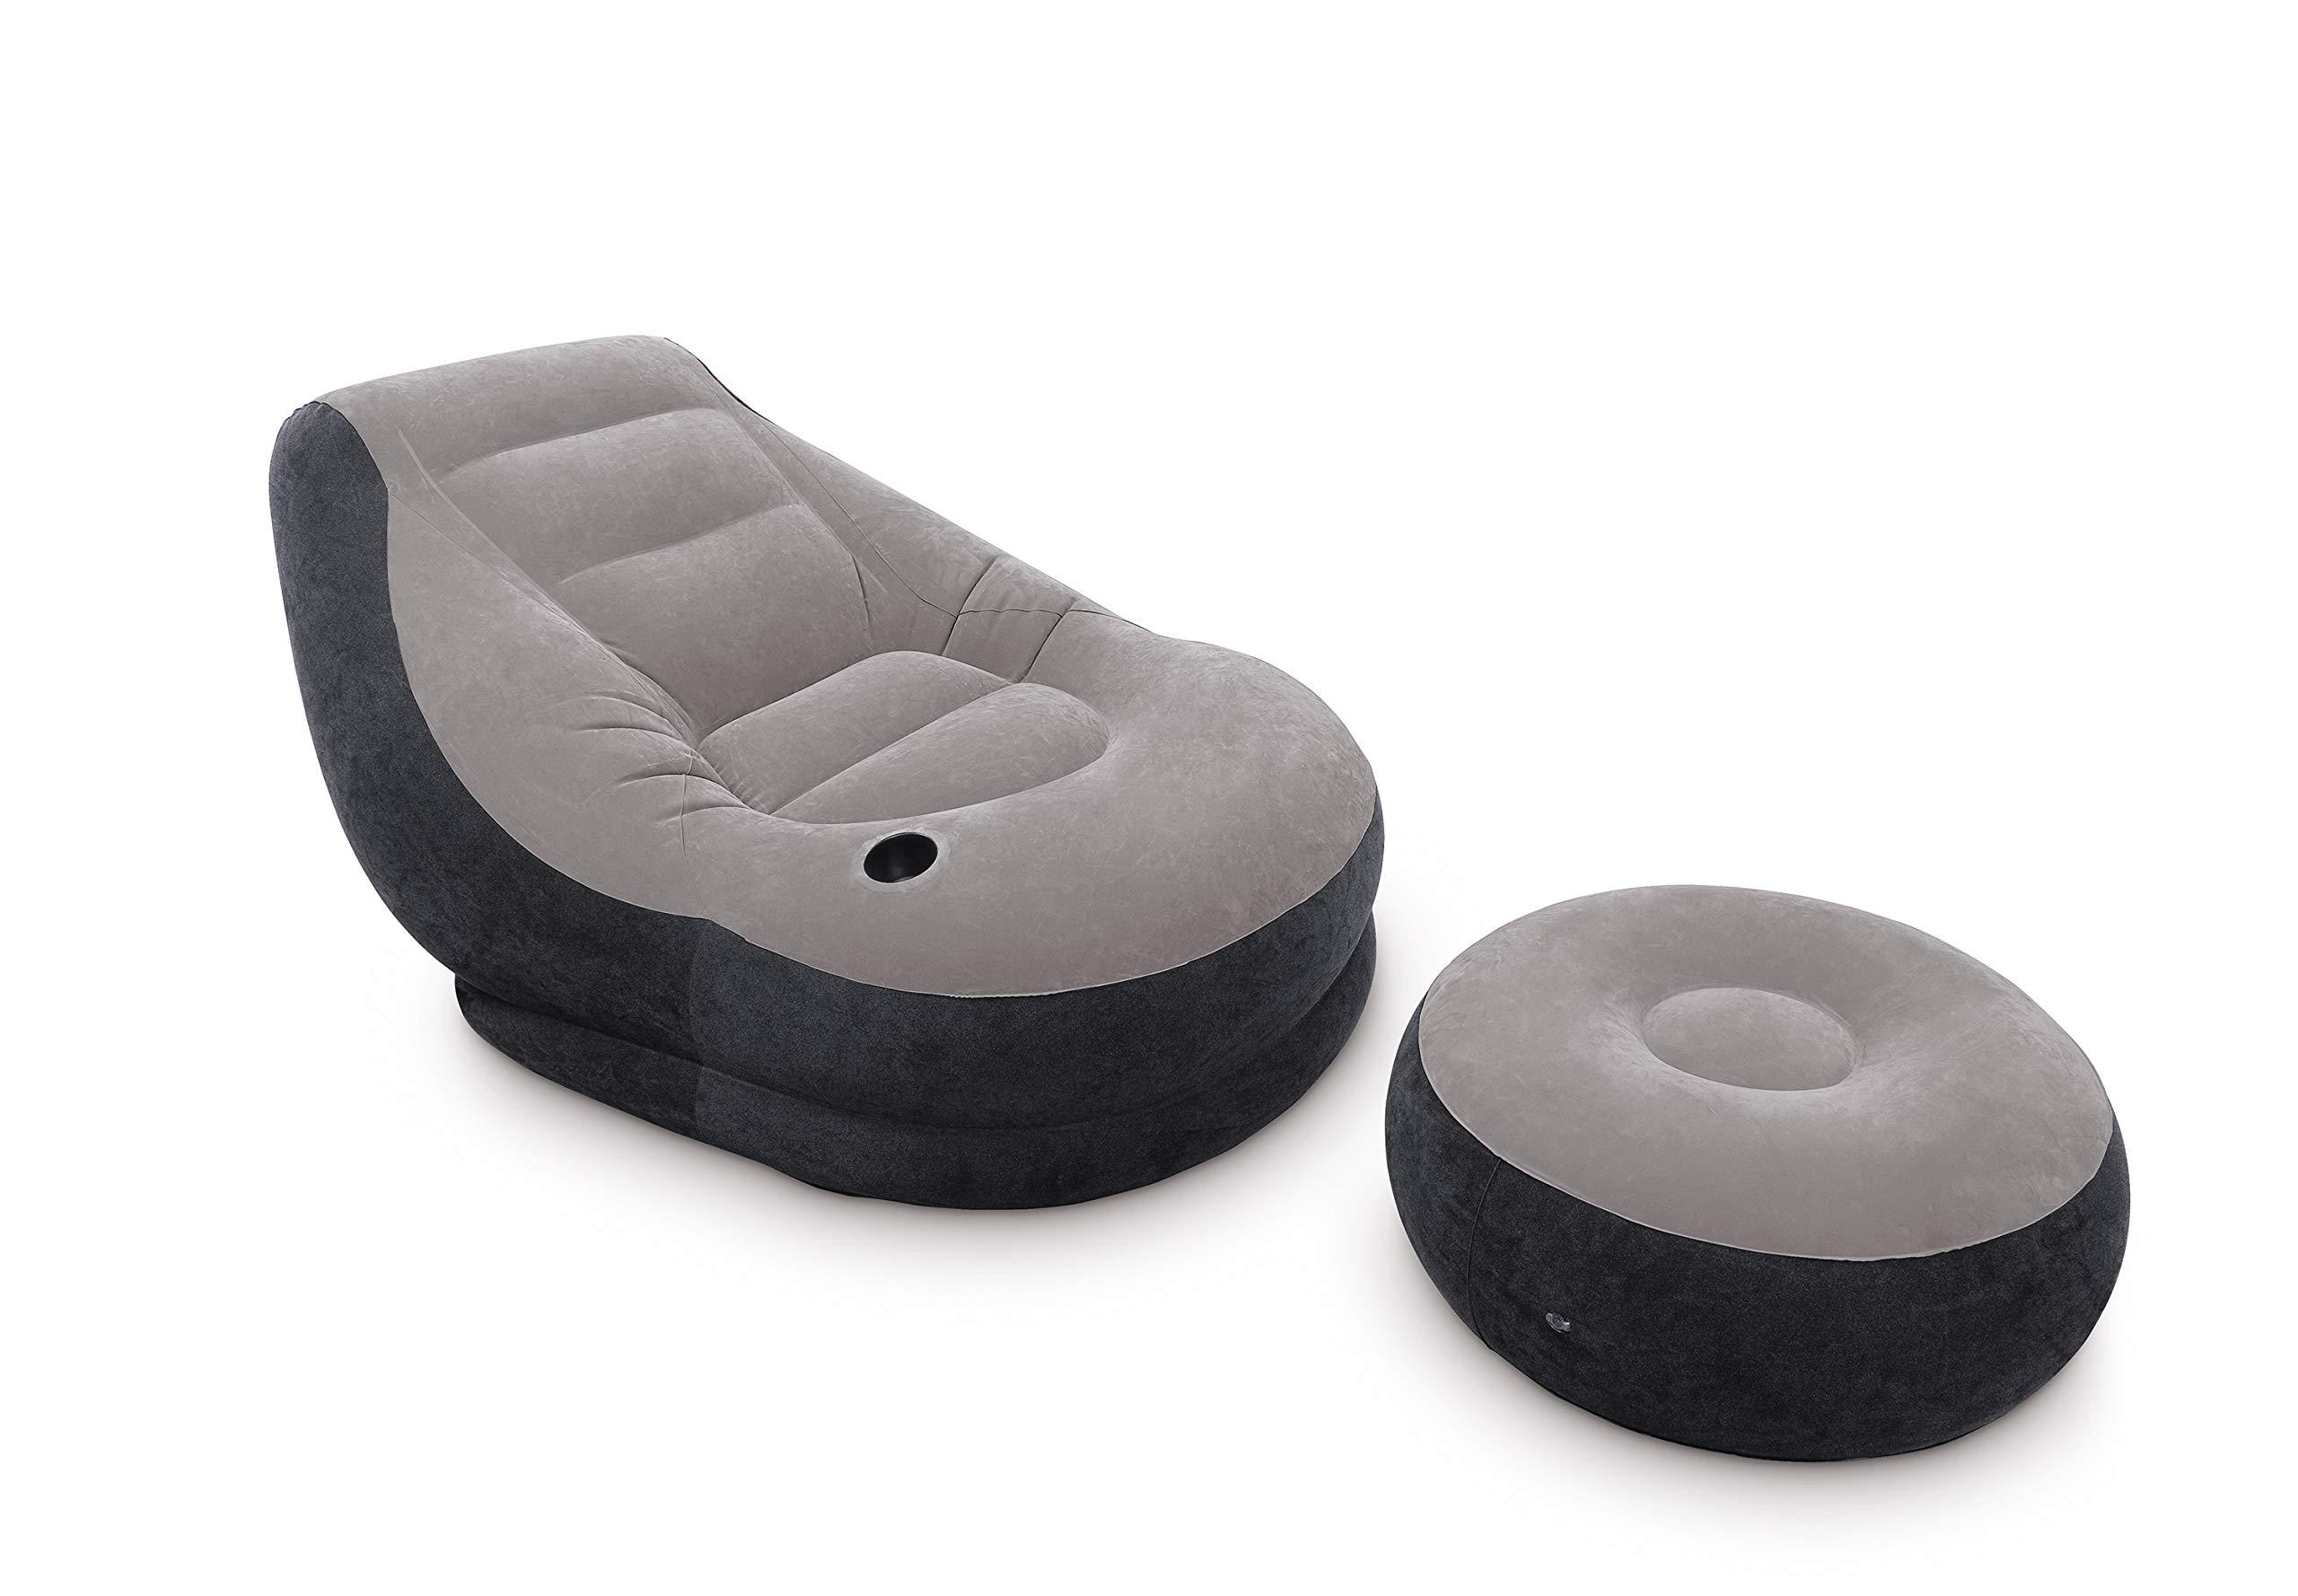 Intex Inflatable Furniture Series